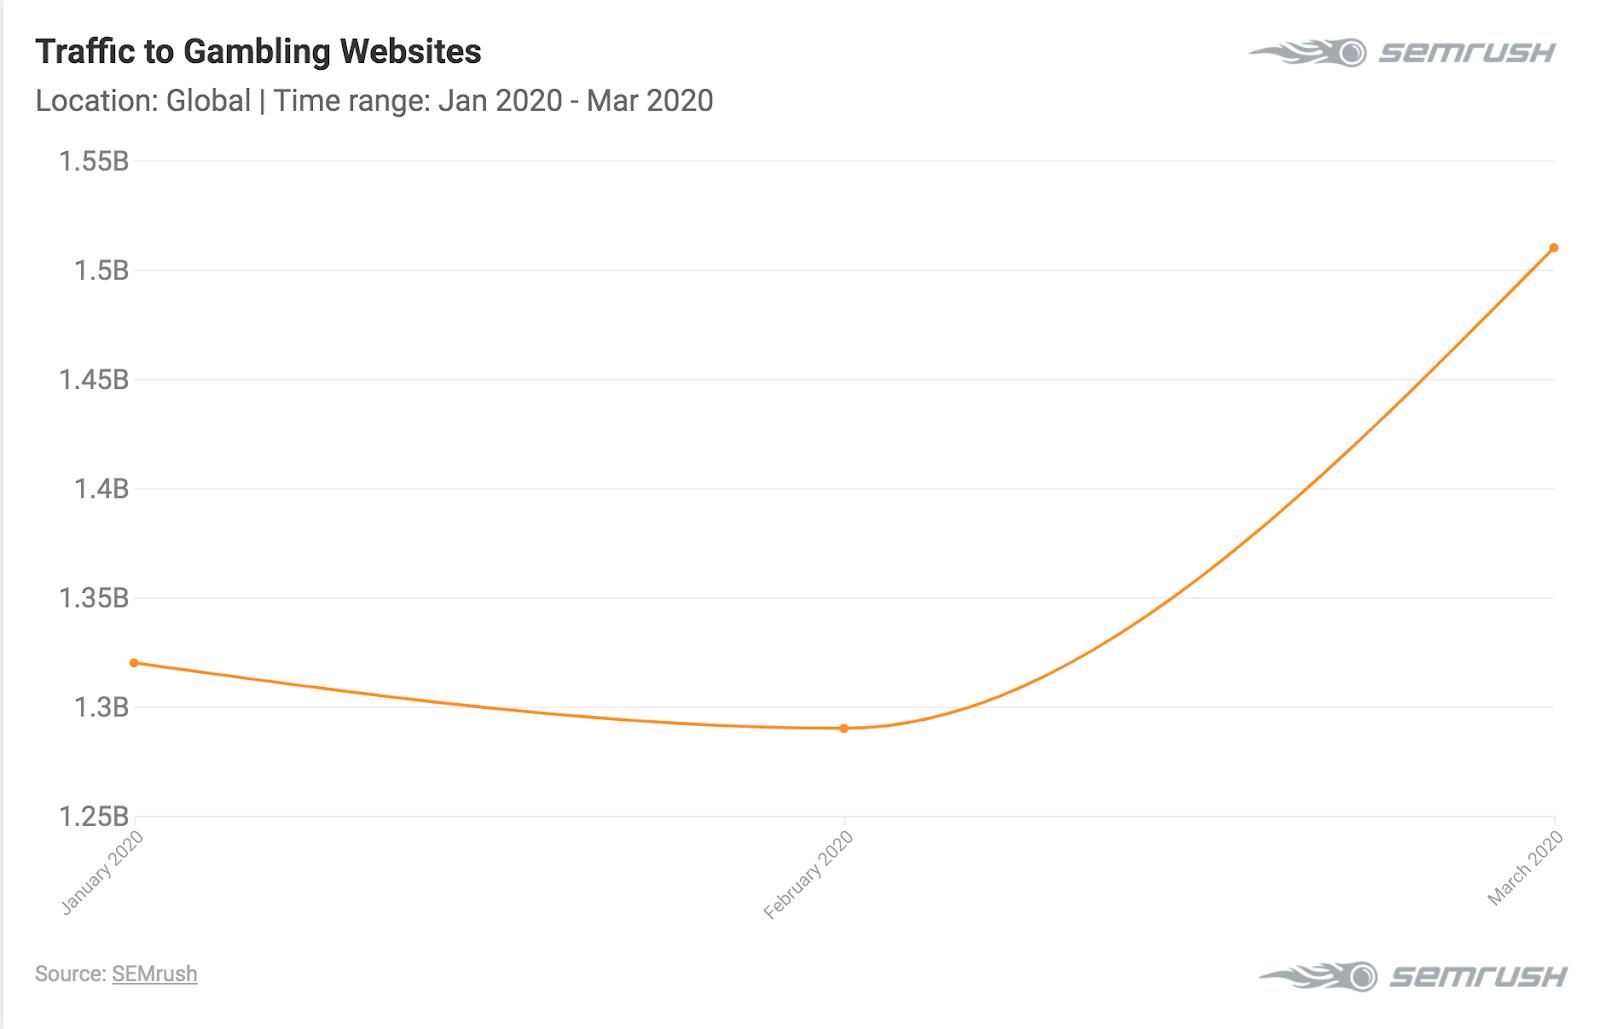 Gambling website traffic increases during coronavirus